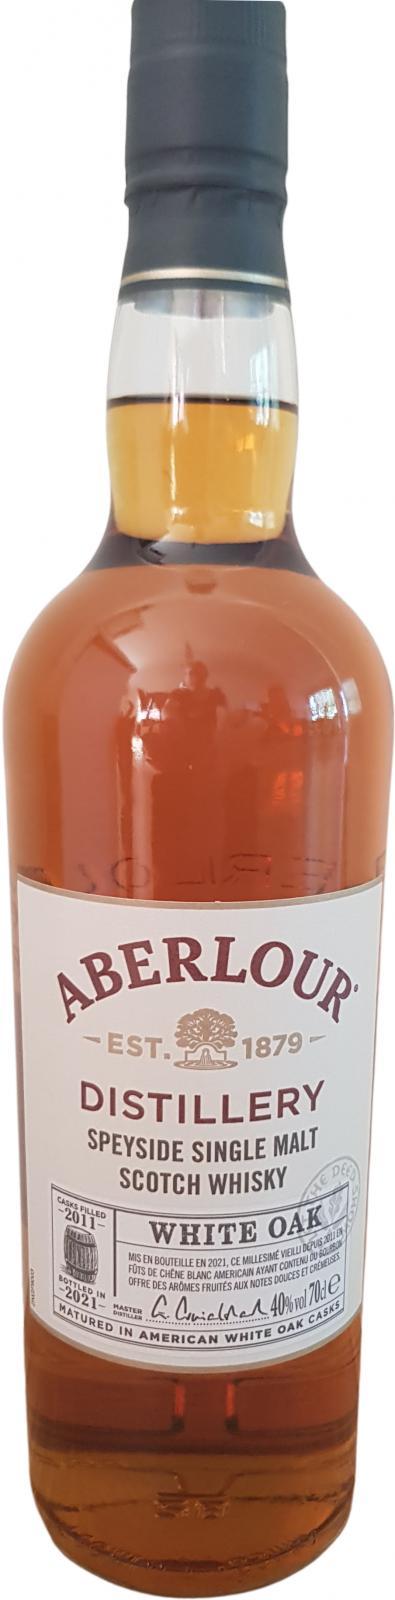 Aberlour 2011